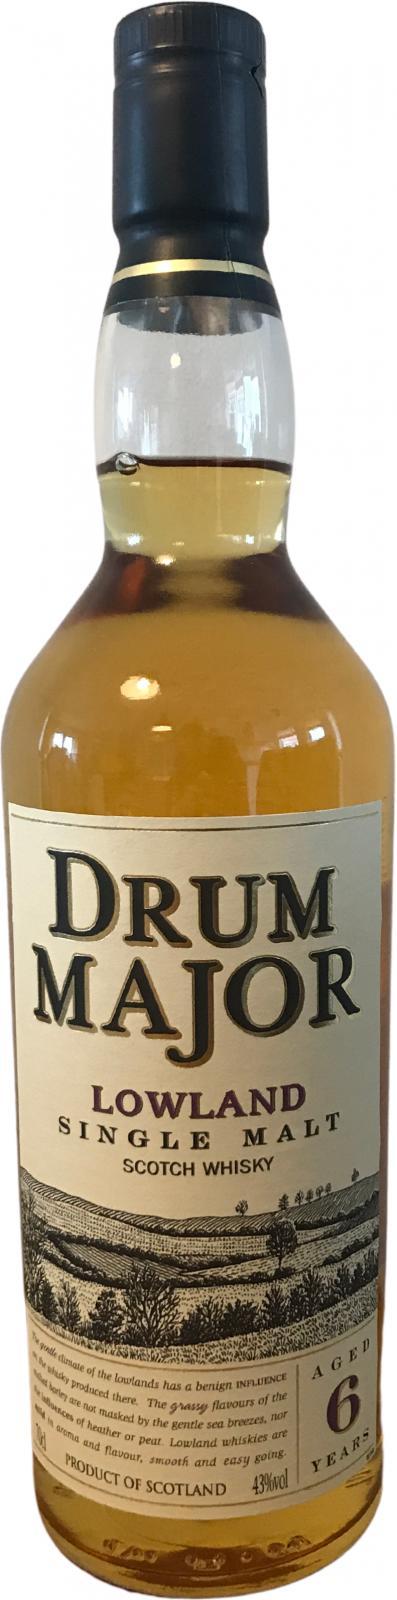 Drum Major 06-year-old